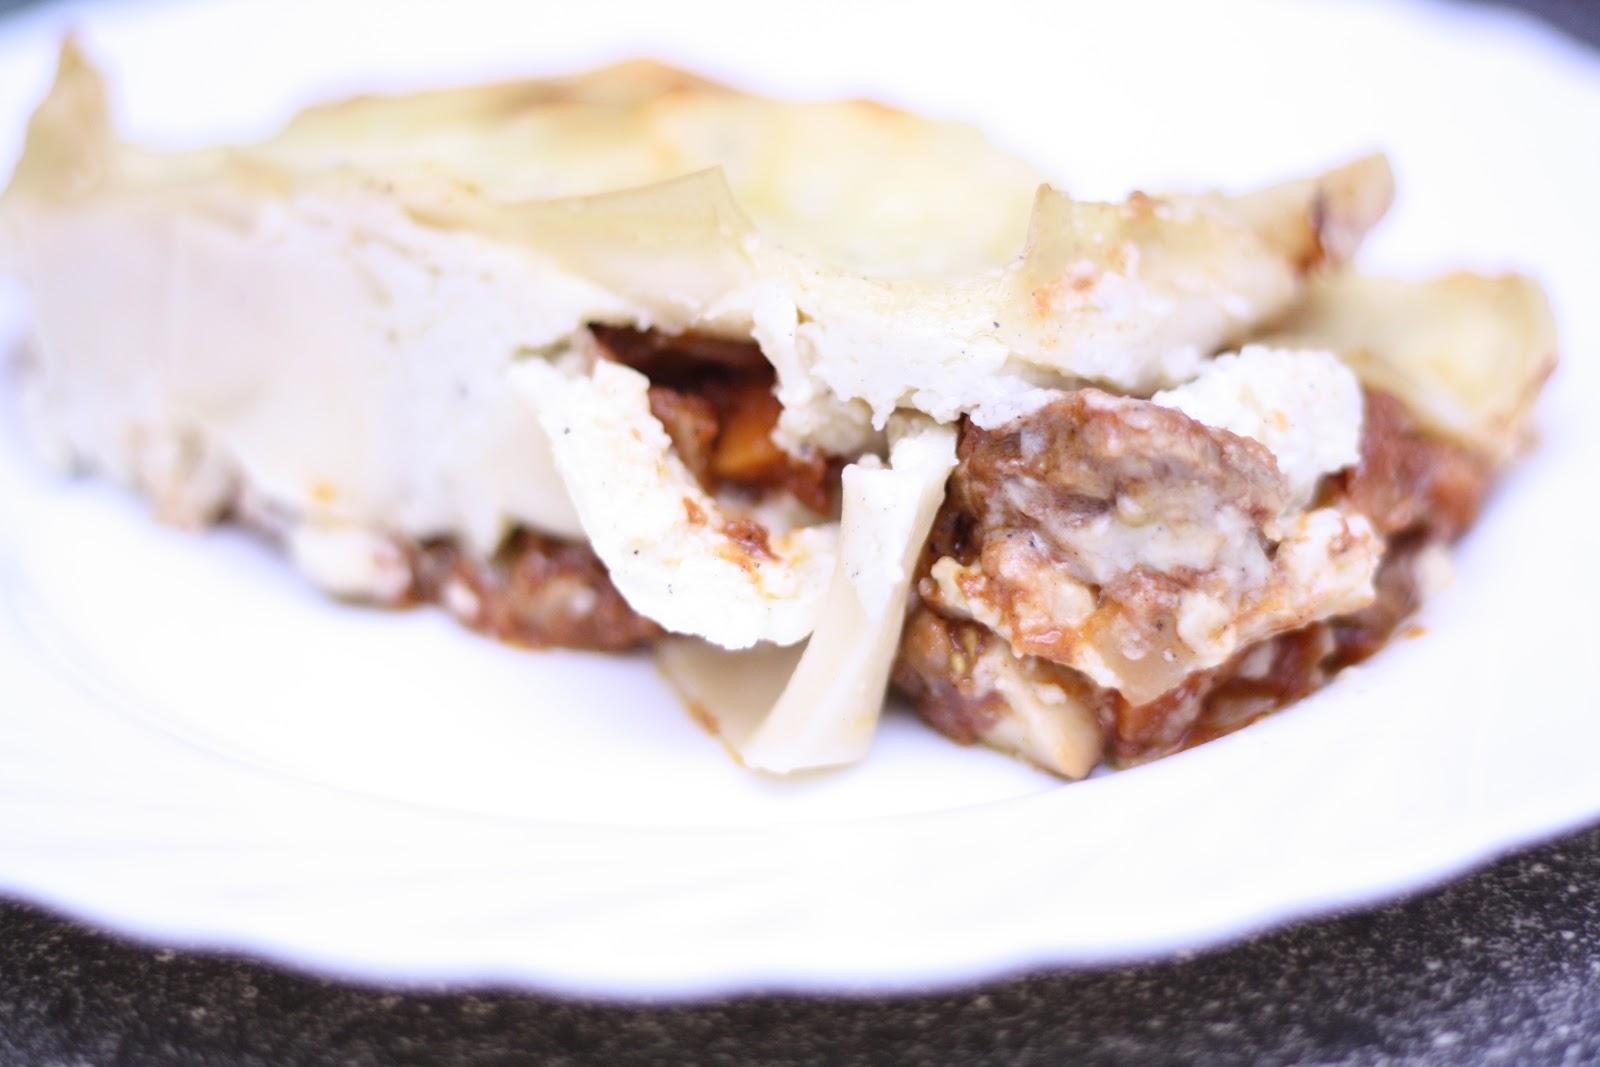 Stir Fry Mushroom and Fucuk with Oyster Sauce | Wanna Makan